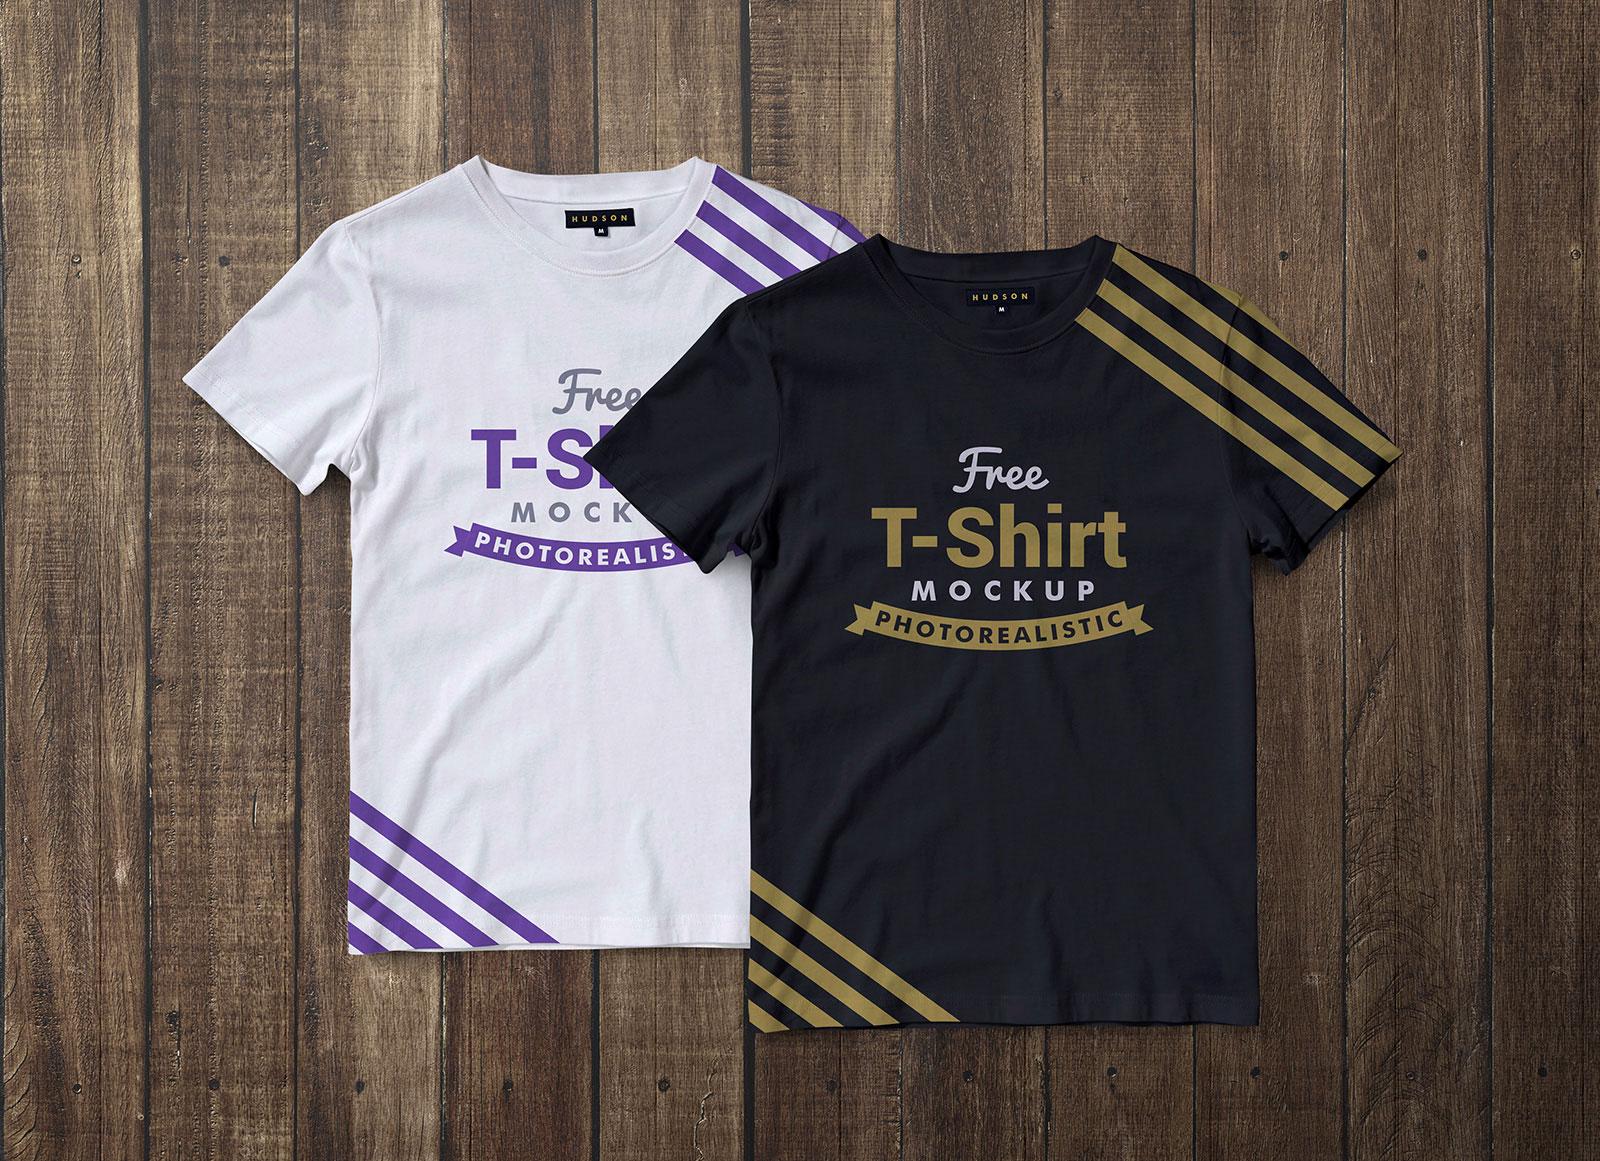 Free-Black-&-White-Half-Sleeves-T-Shirt-Mockup-PSD-File